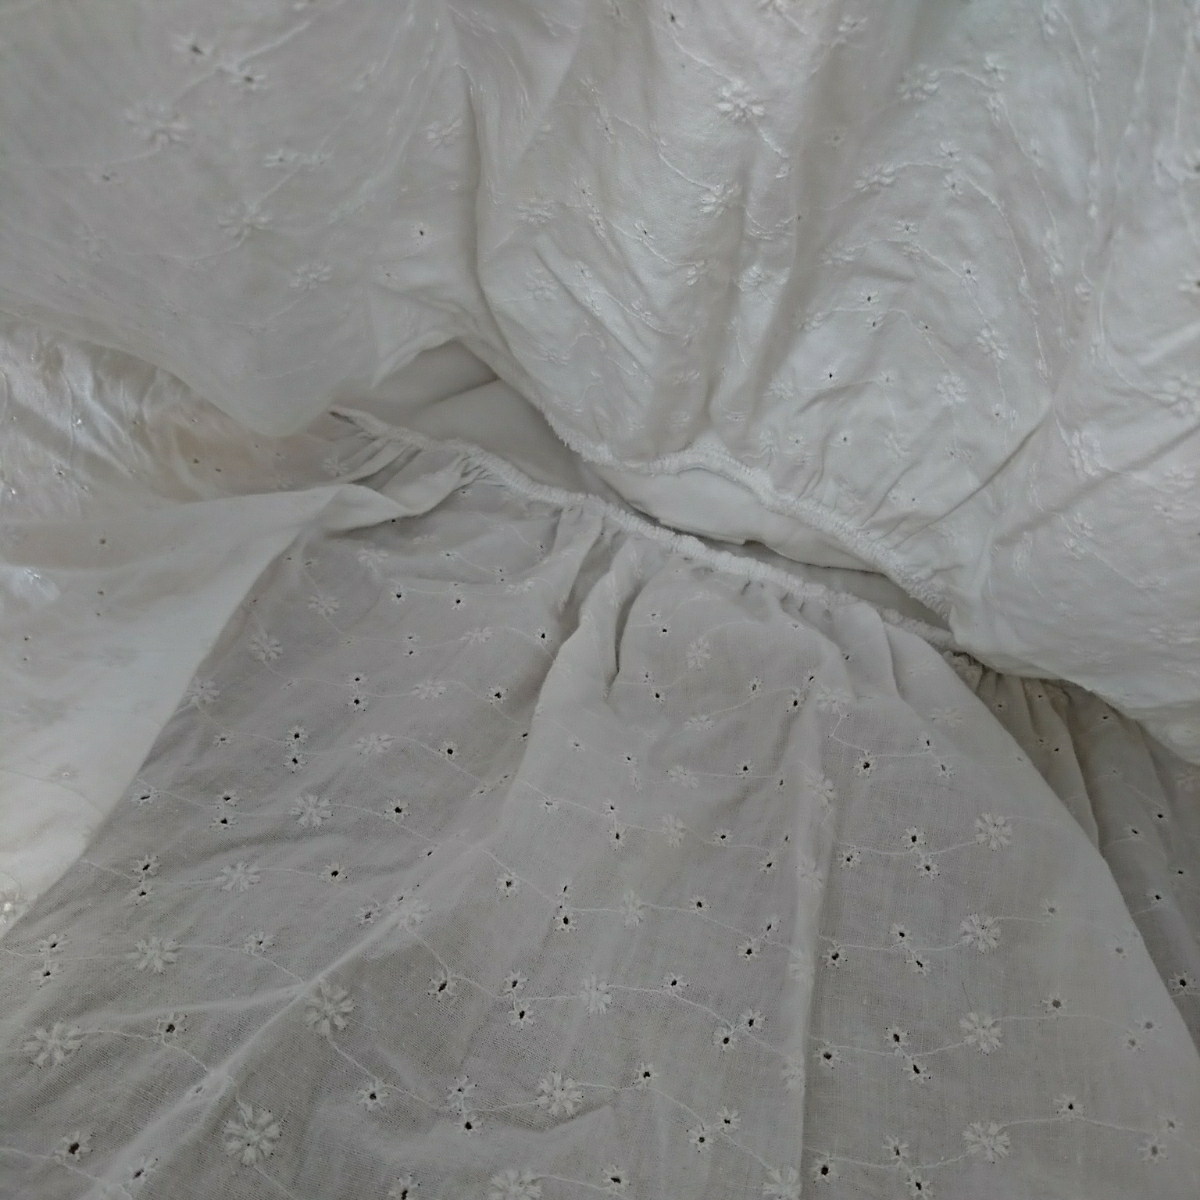 Dazzlin/ダズリン リボン付き ふわっとしたチュニック 半袖カットソー 白 S  527